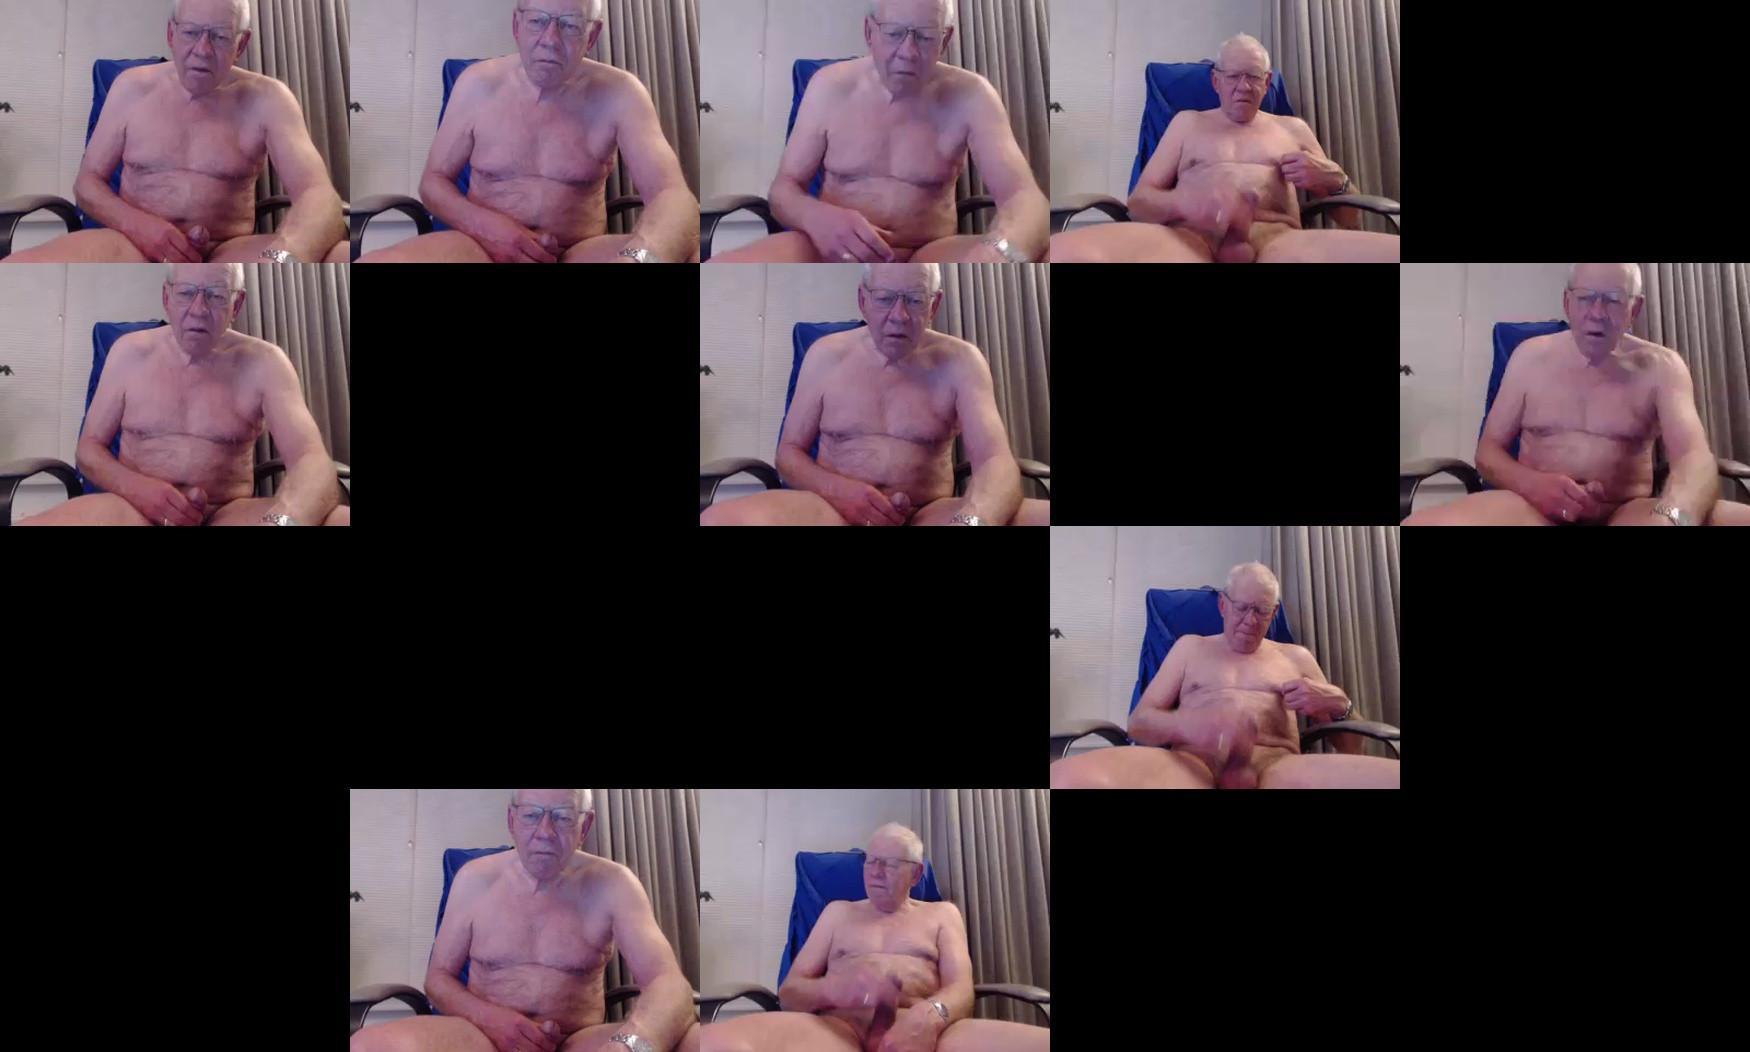 gdekker Cam4 04-03-2021 Recorded Video Topless